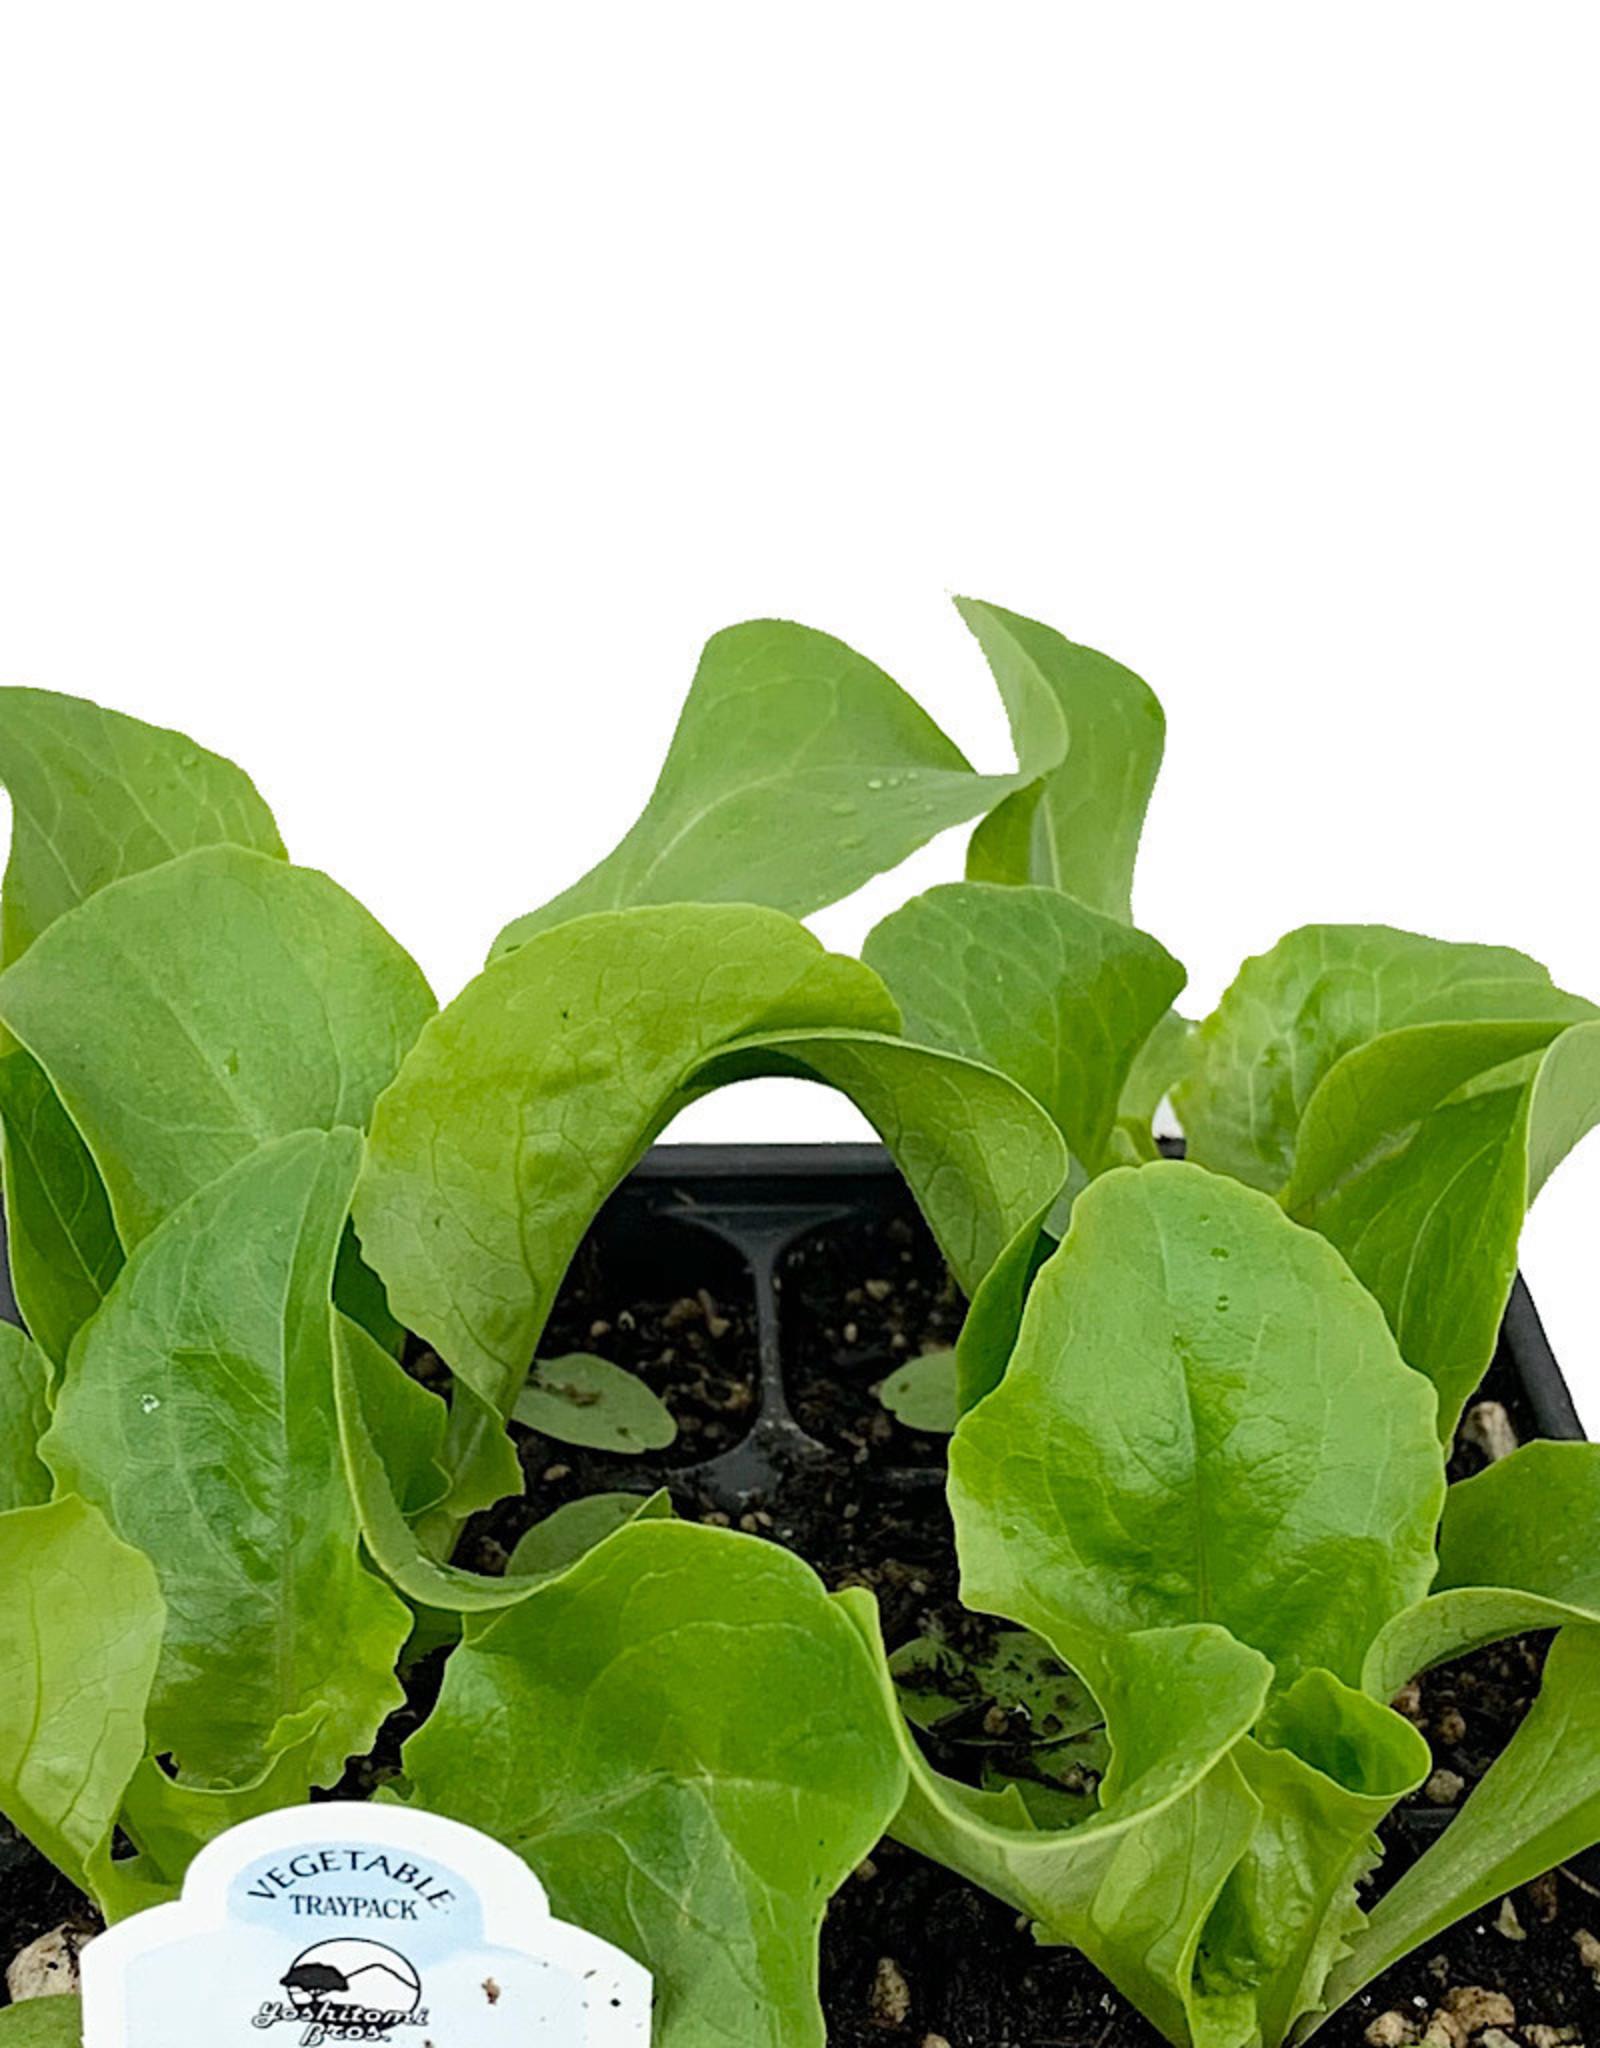 Lettuce 'Buttercrunch' Traypack